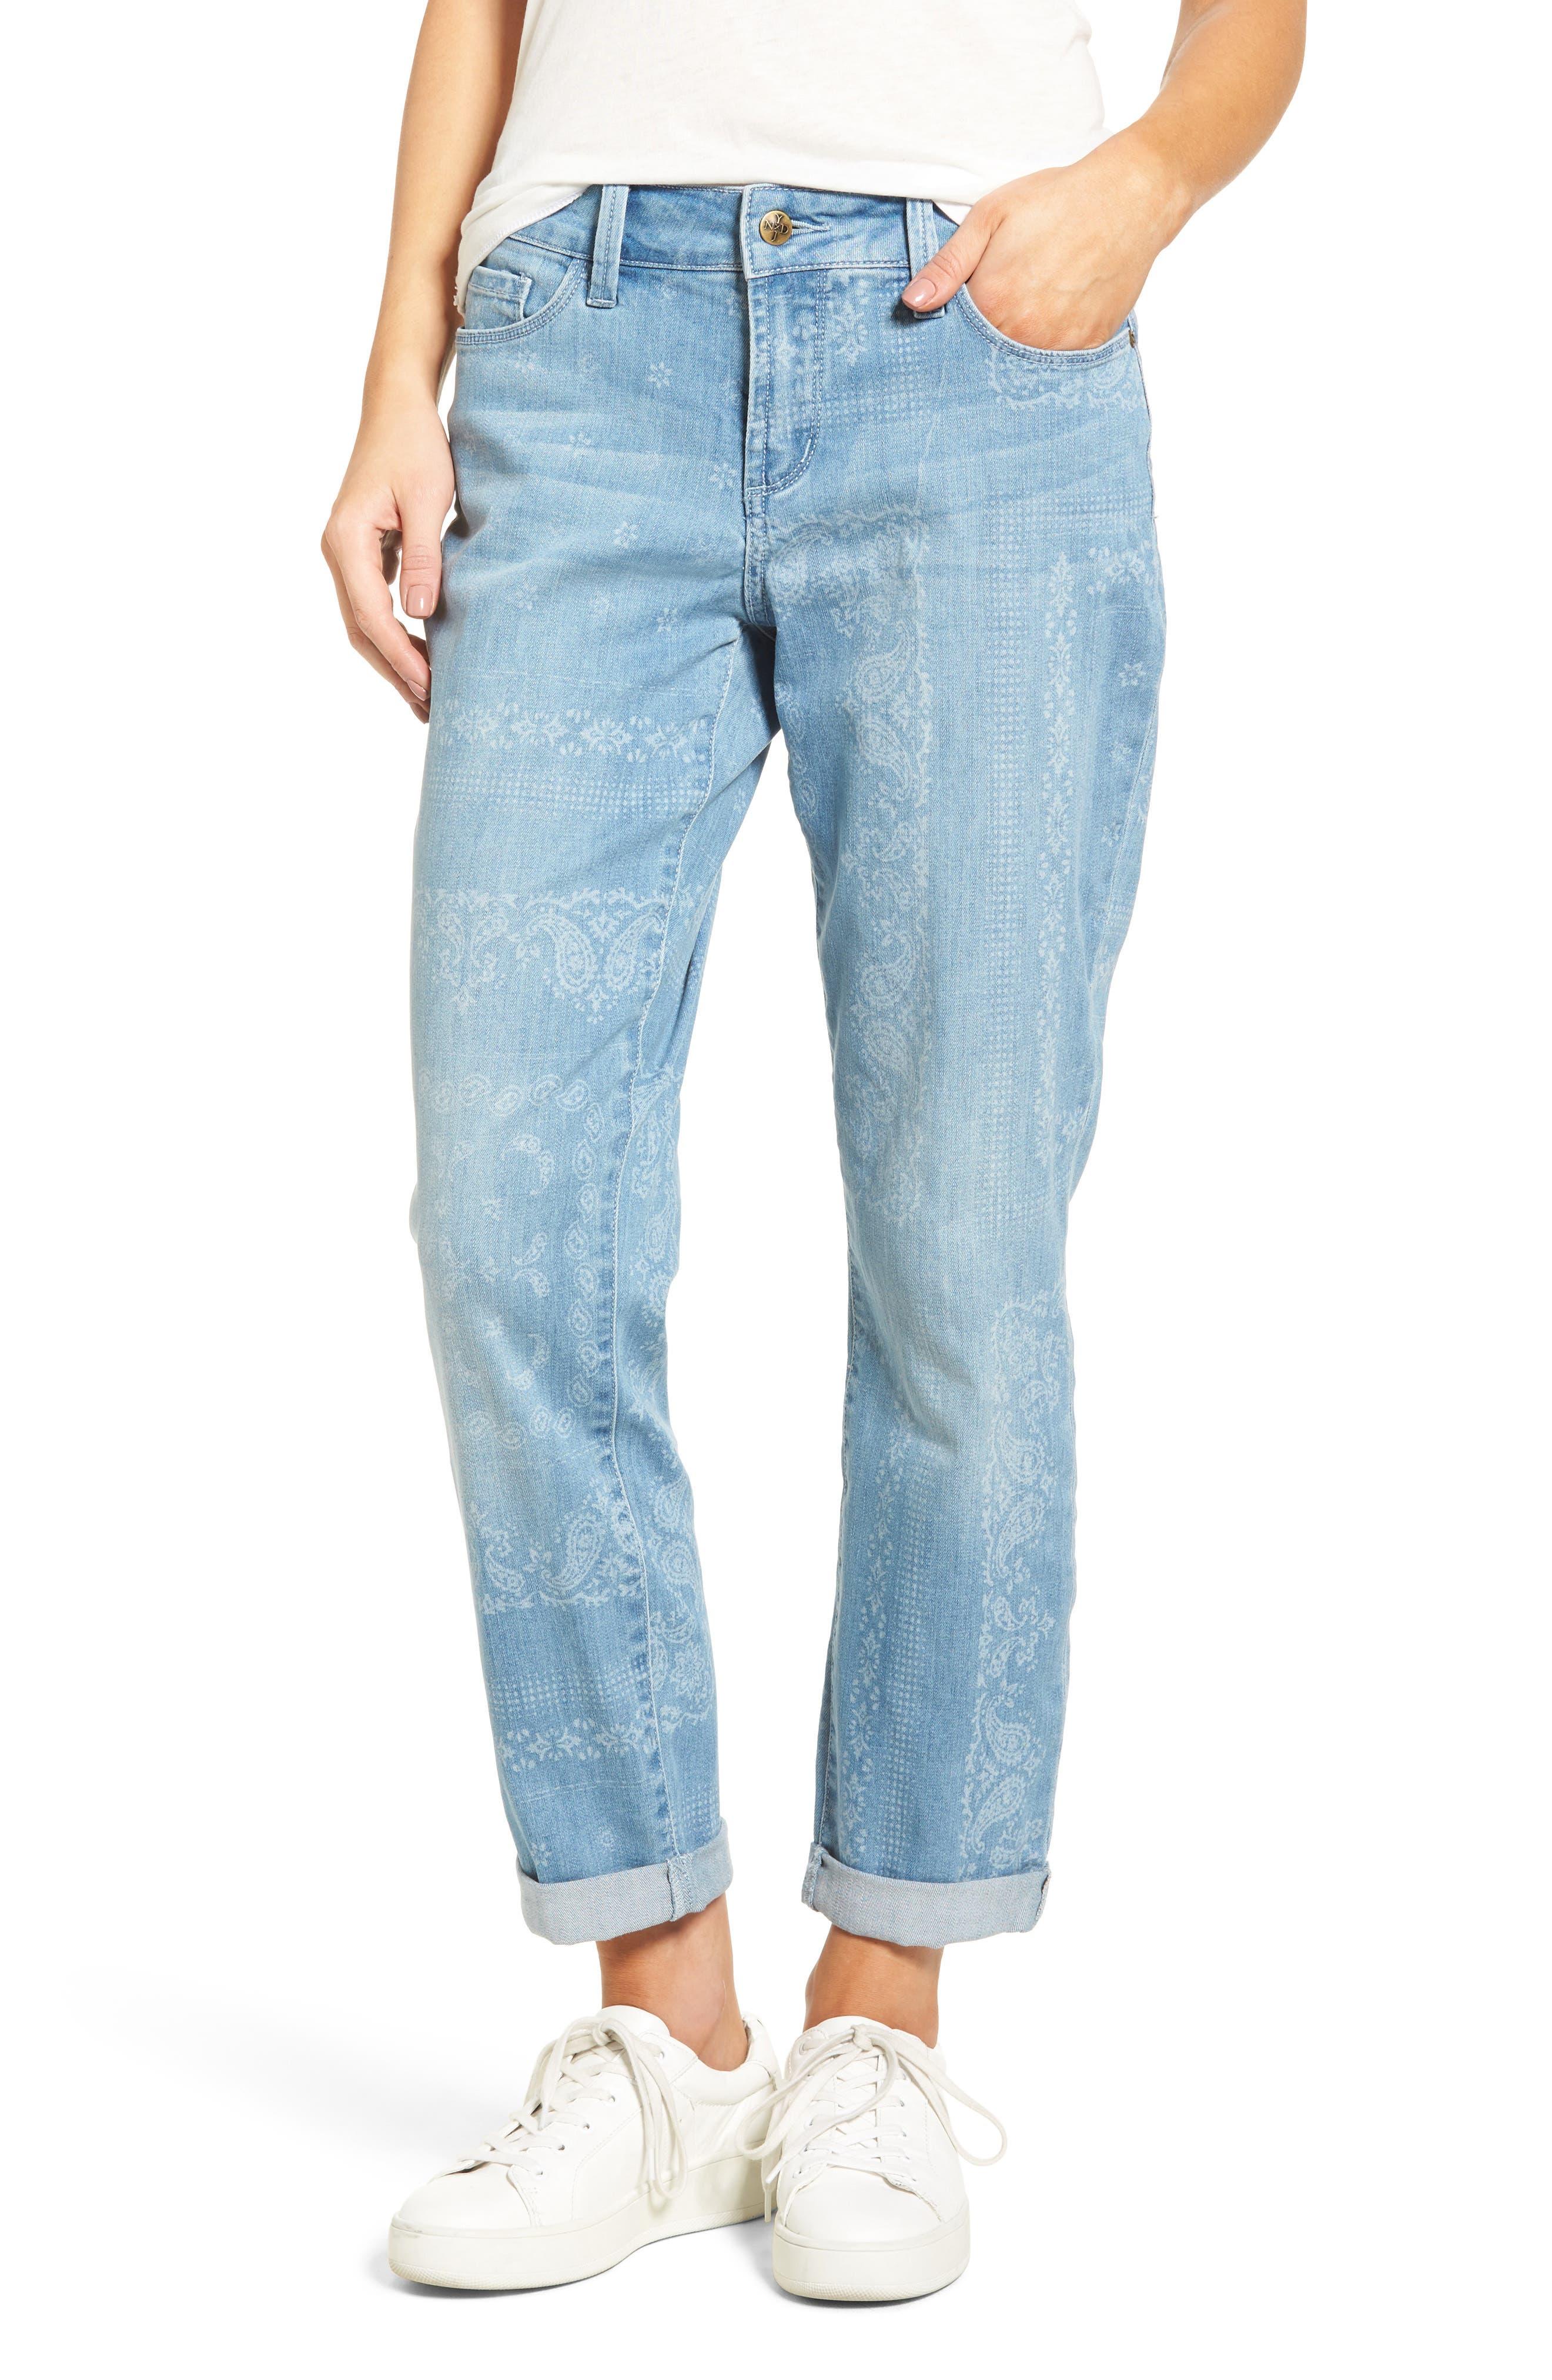 Alternate Image 1 Selected - NYDJ Jessica Print Relaxed Boyfriend Jeans (Bandana) (Regular & Petite)